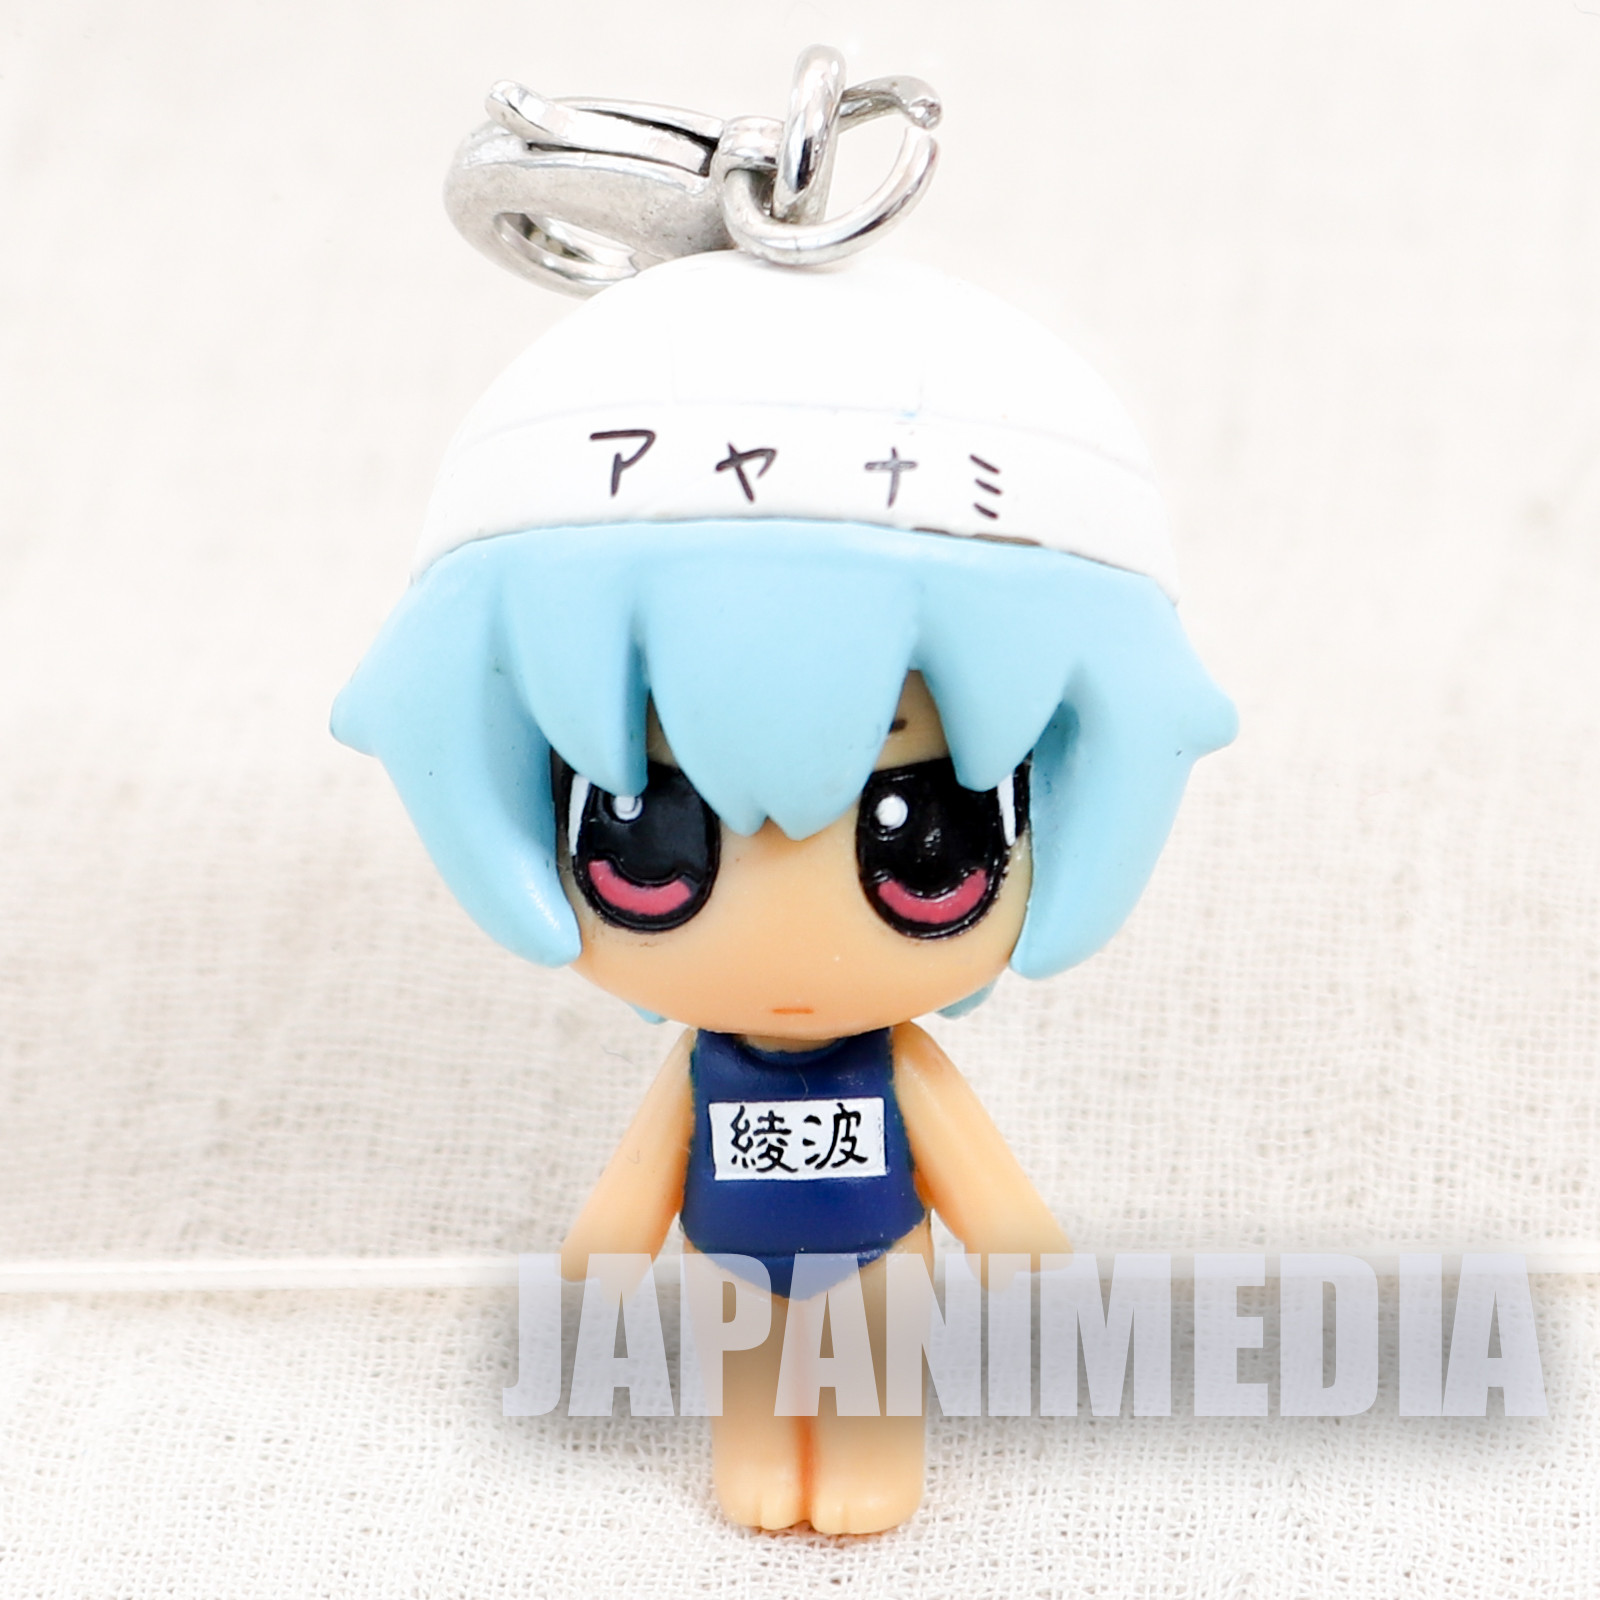 Evangelion Rei Ayanami Swimsuit Petit EVA Chara Fortune Mini Figure Charm